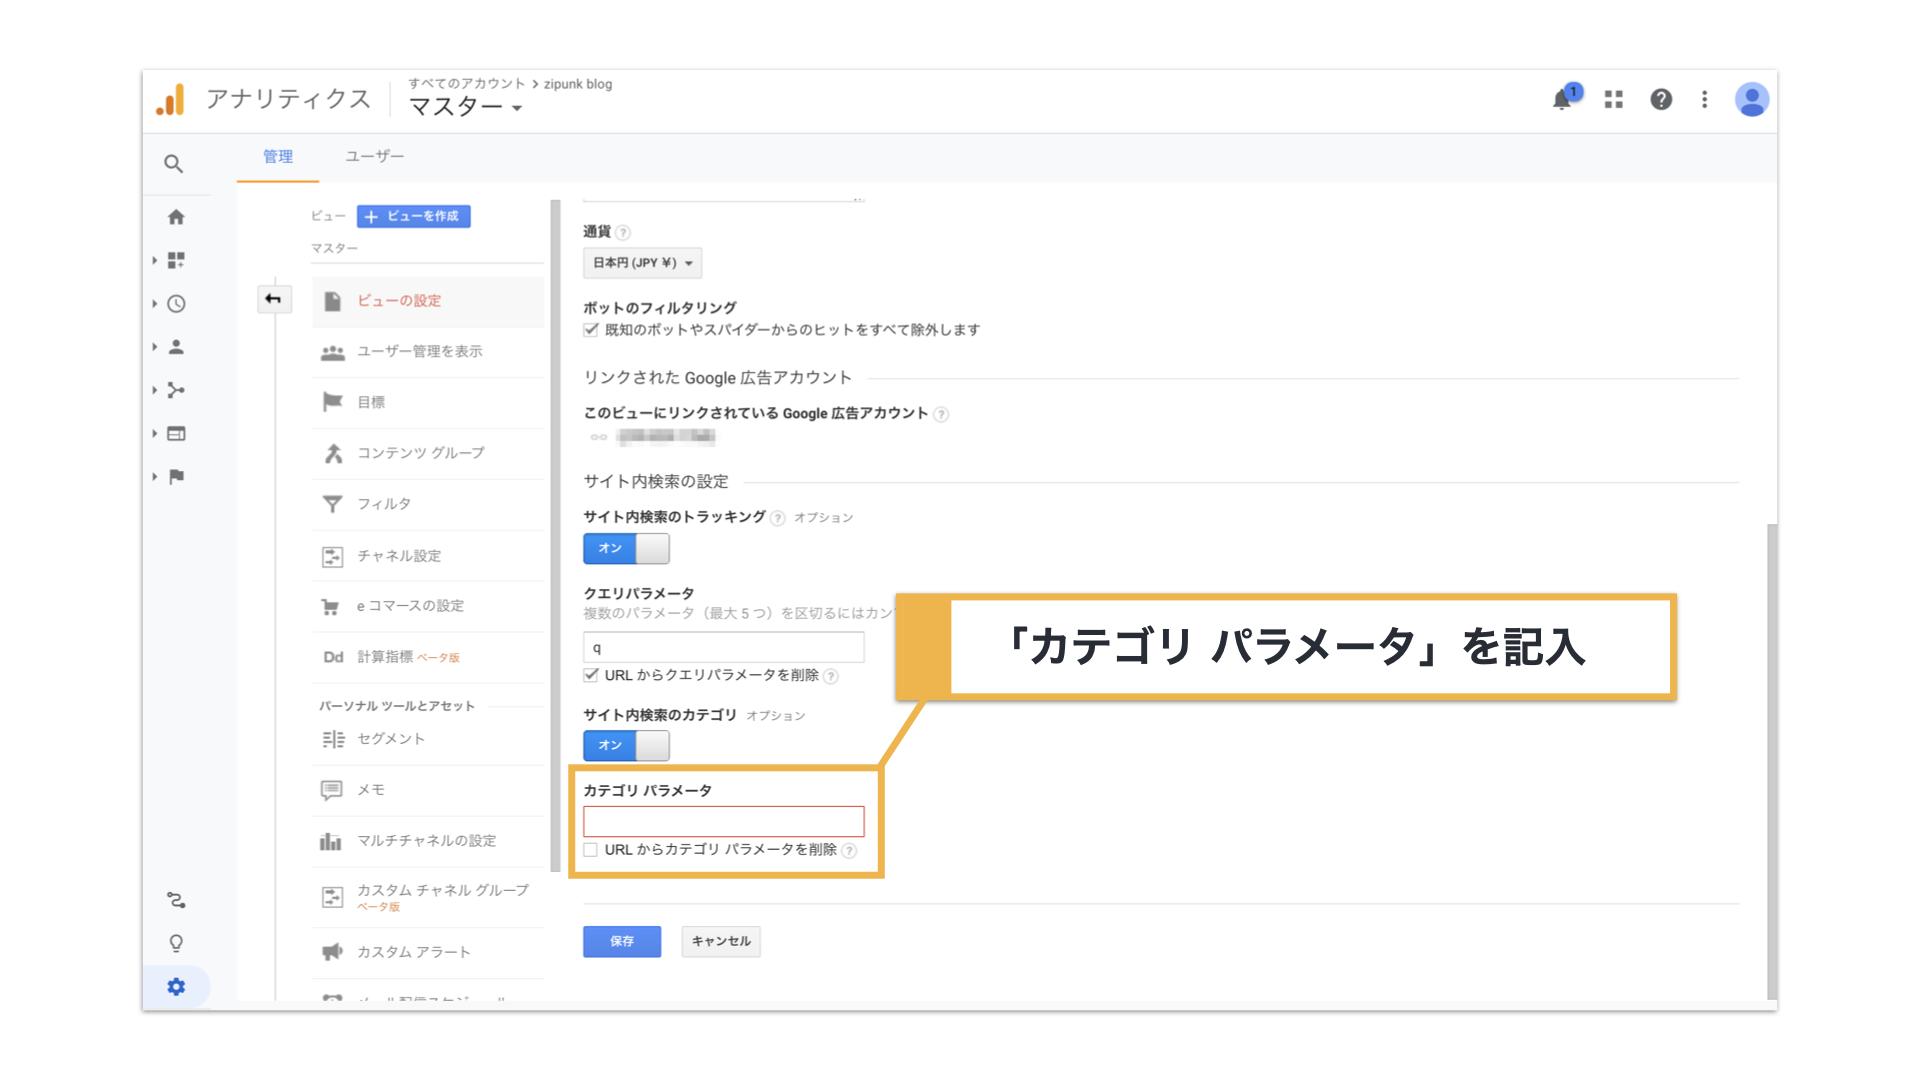 ga-site-search-setting-3